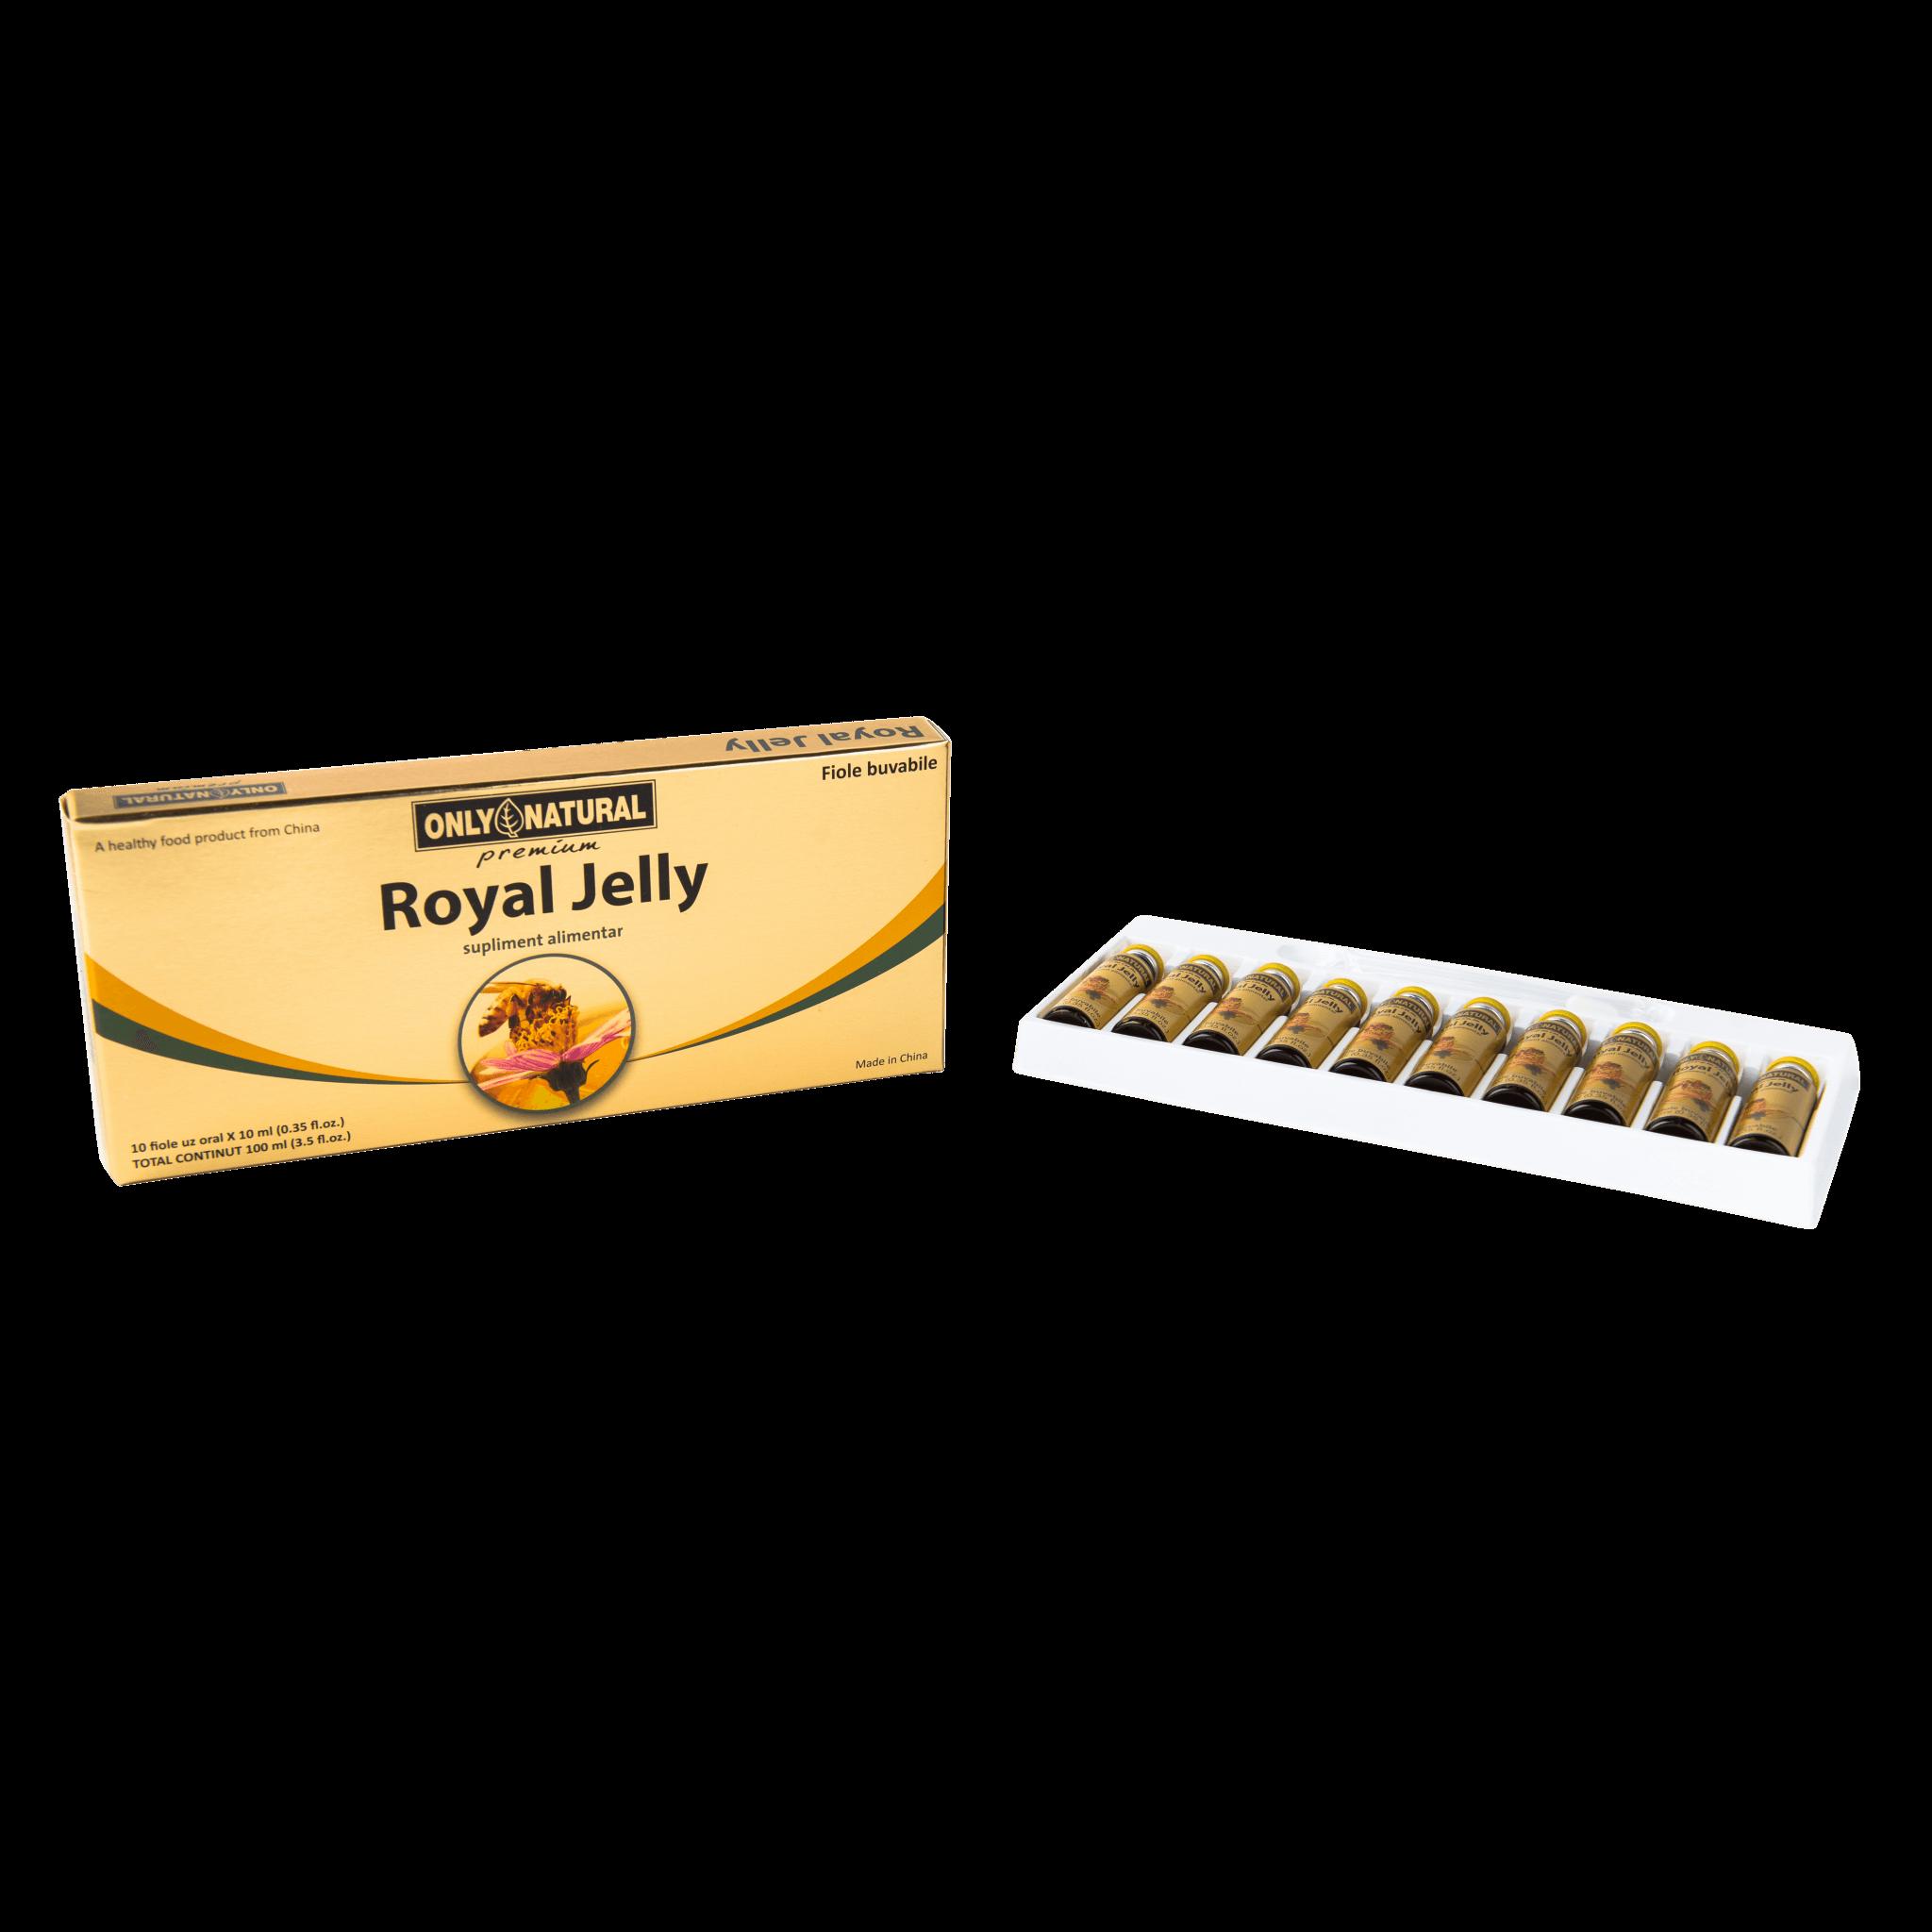 royal jelly fiole